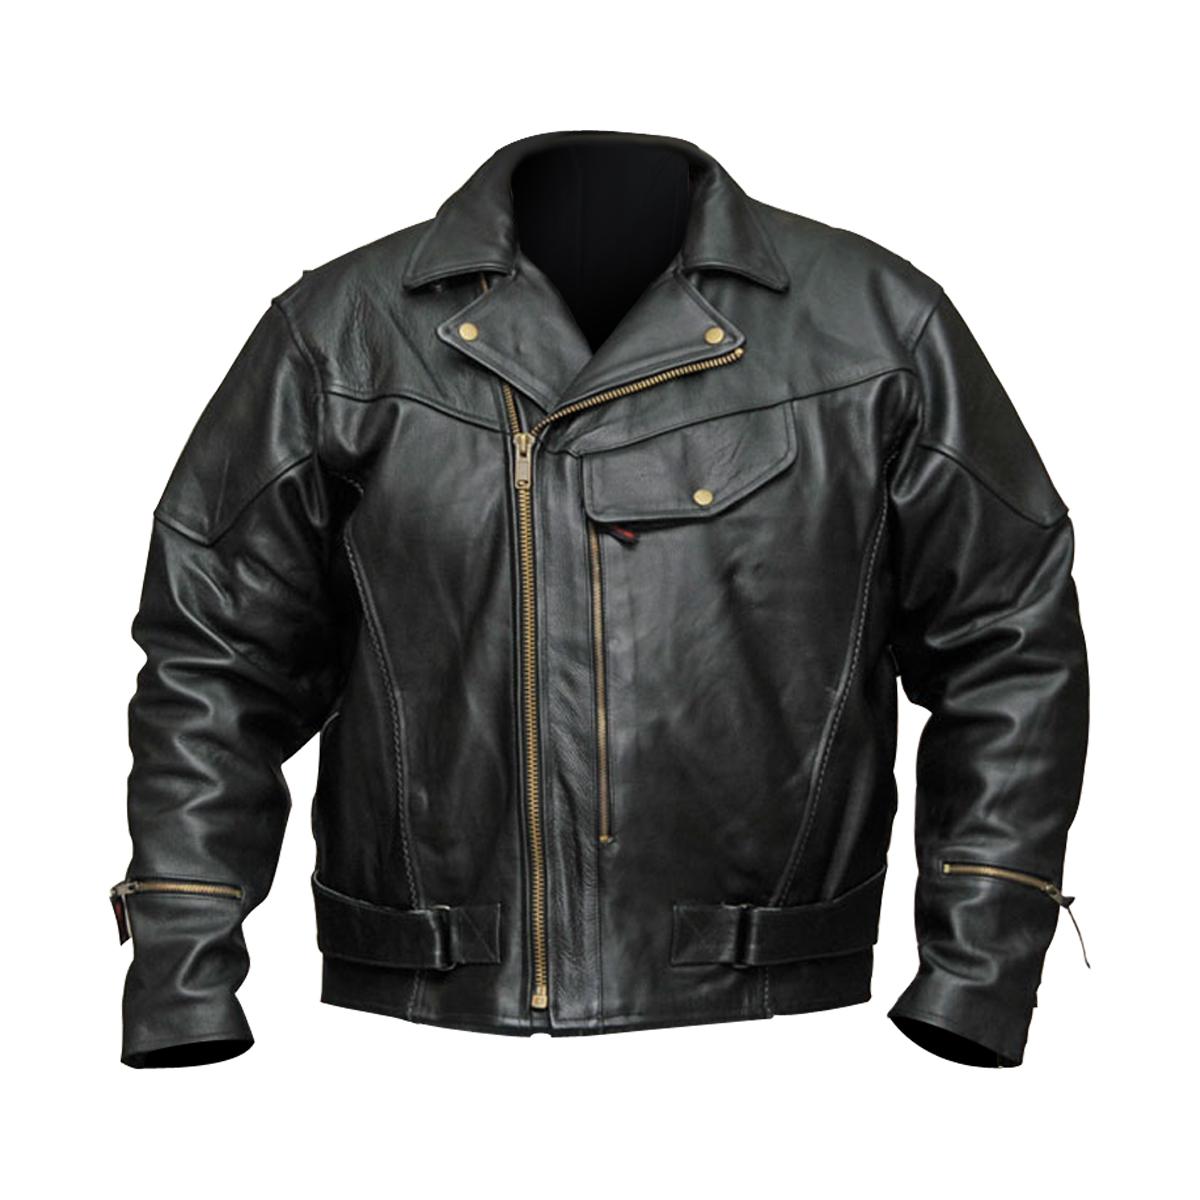 motorcycle leather jacket menu0027s pistol pete-chief premium leather motorcycle jacket ticjkyx